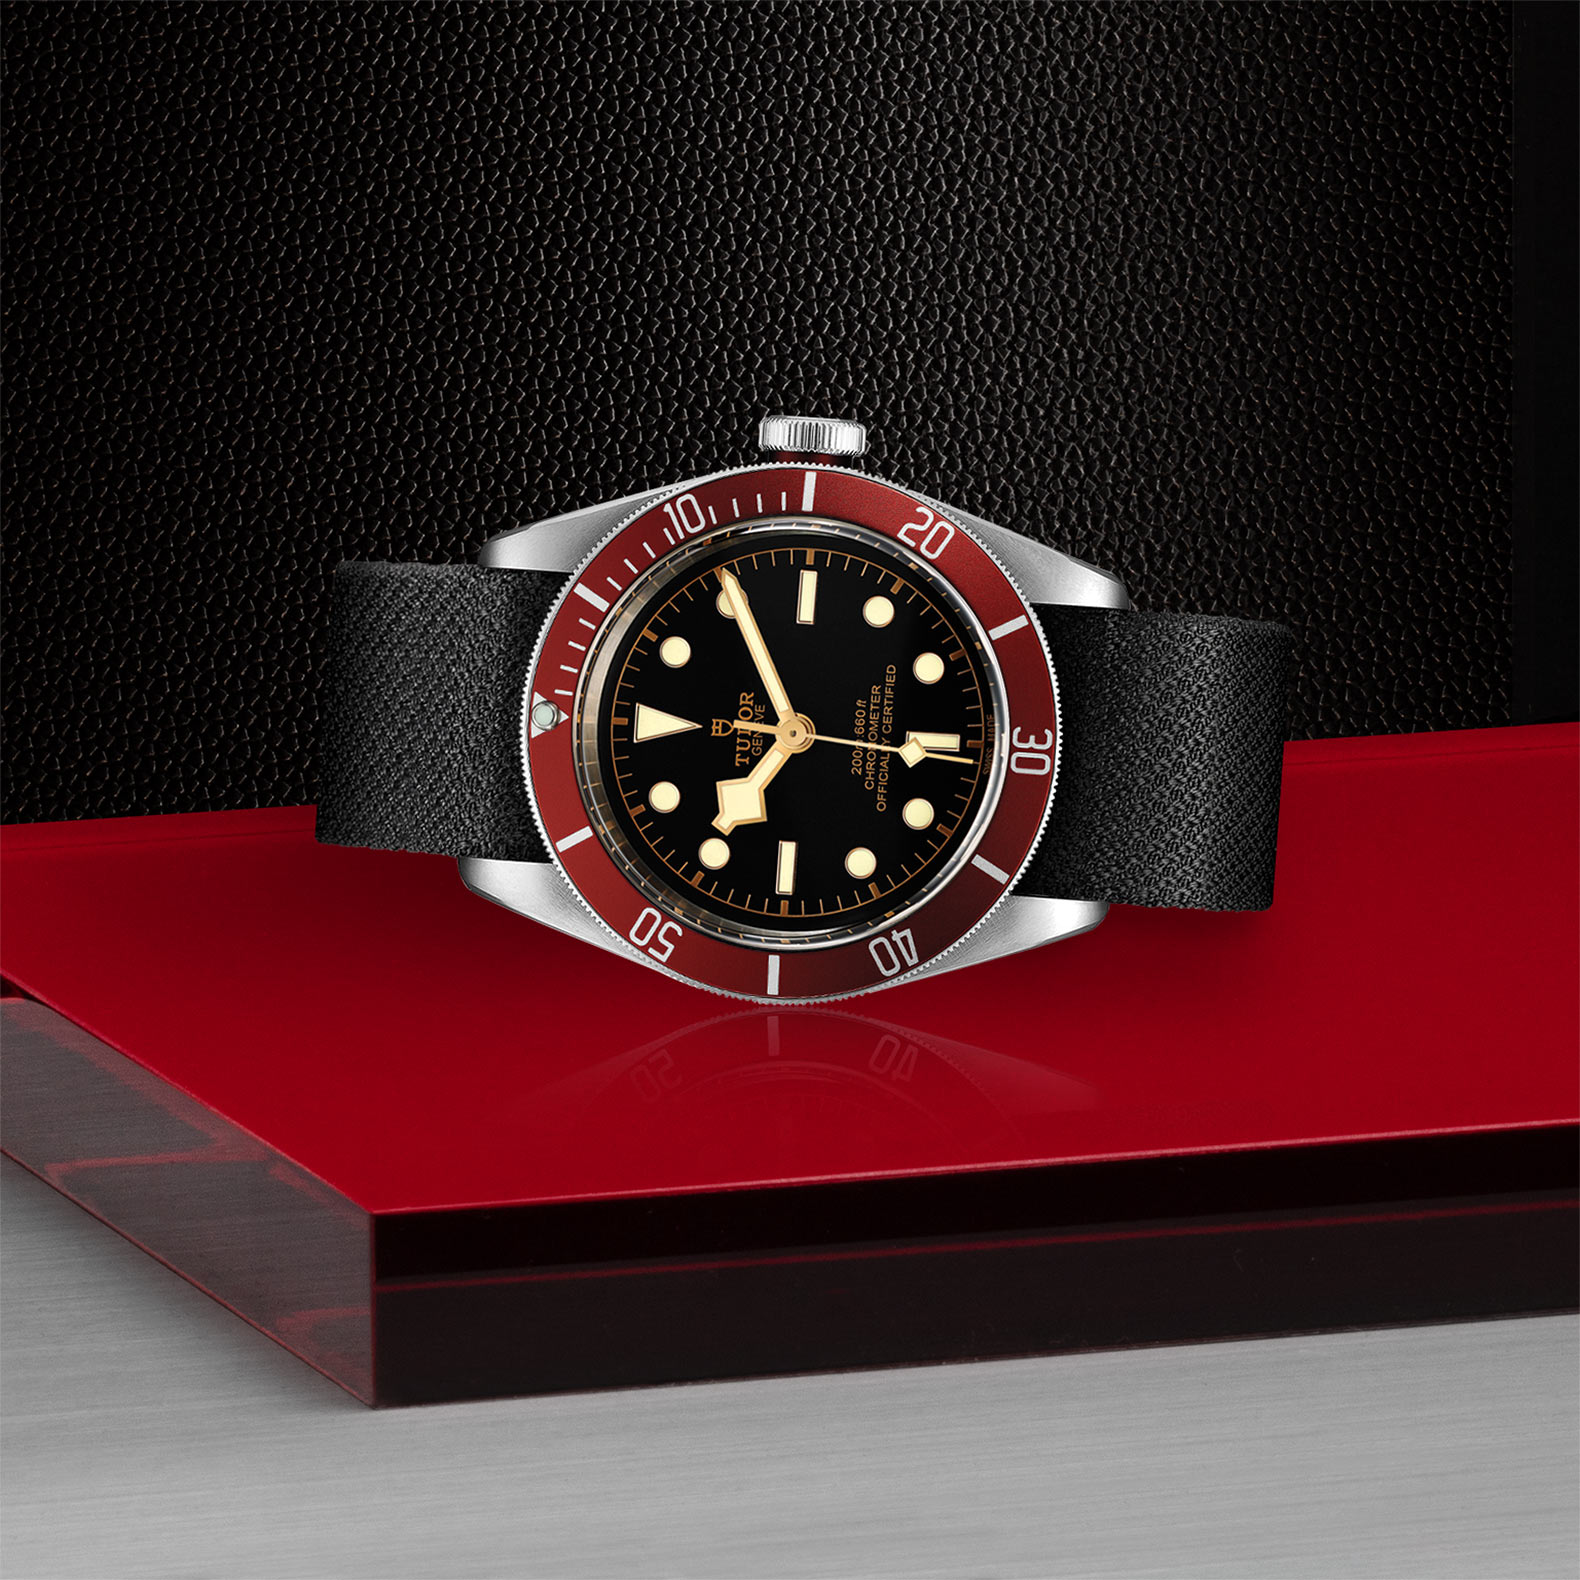 TUDOR Black Bay - M79230R-0010